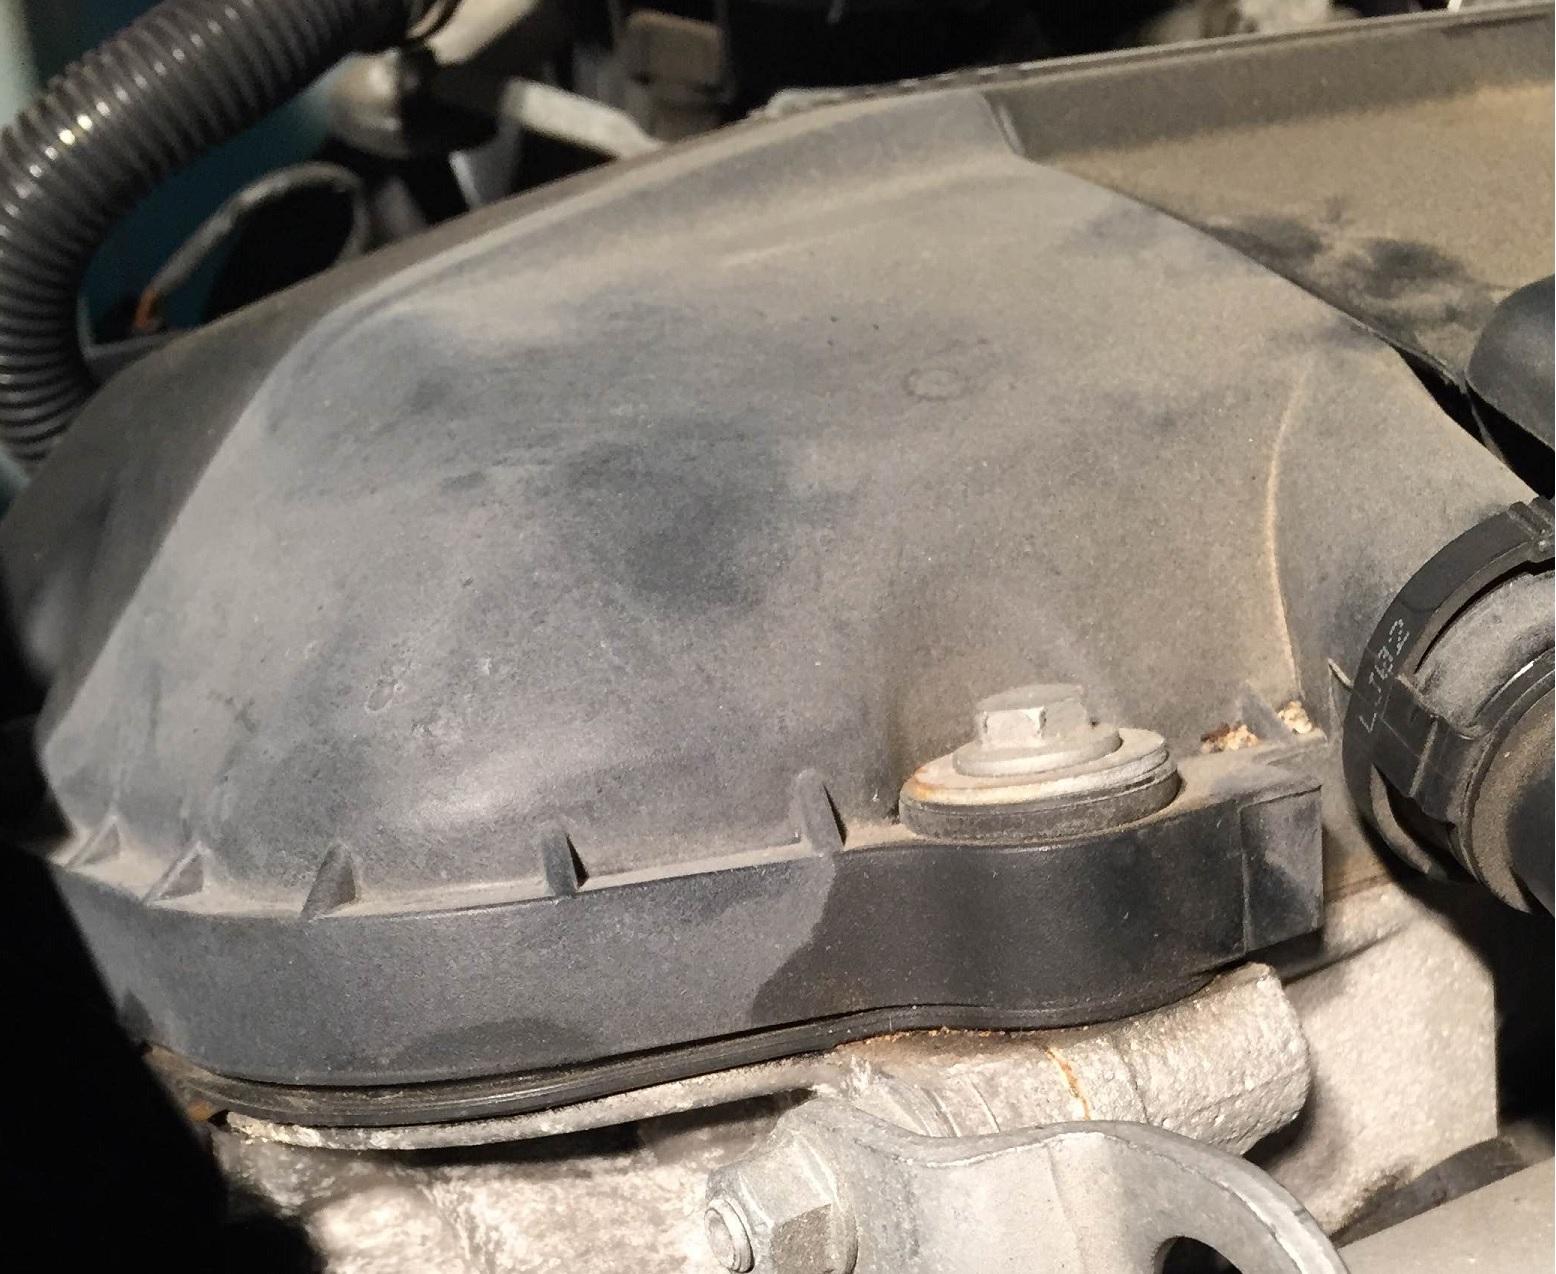 bmw e60 cracked exhaust manifold symptoms